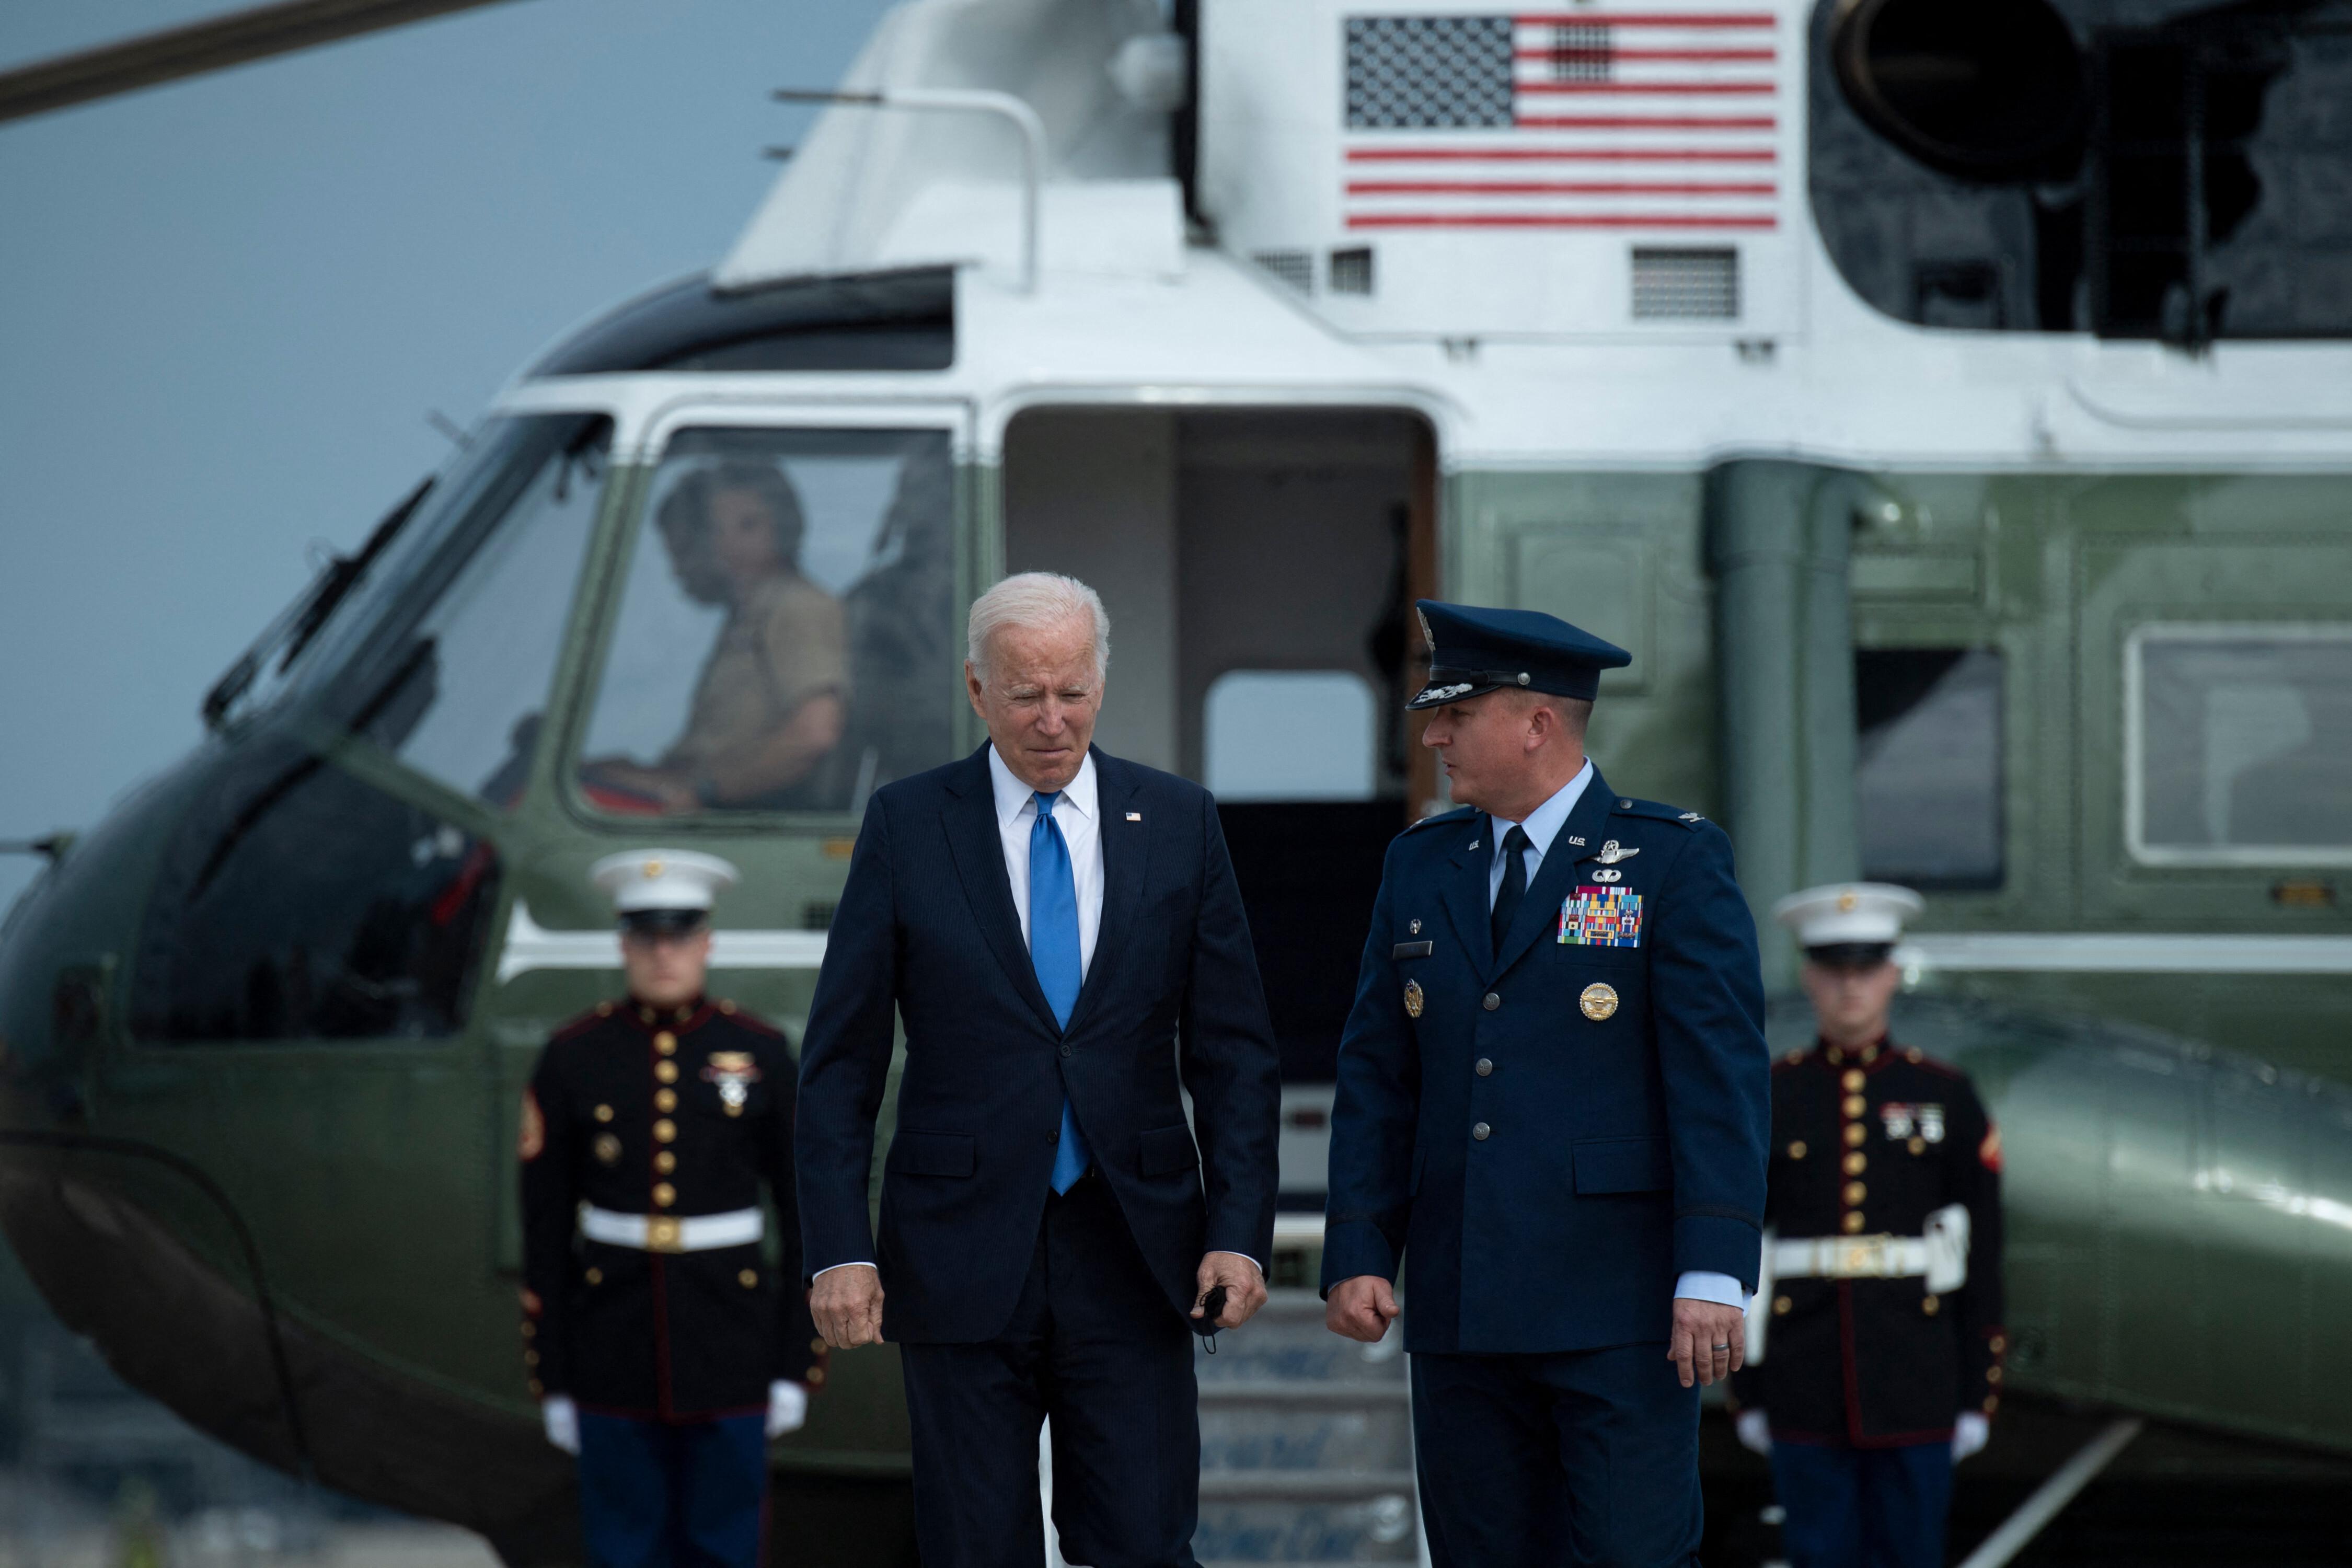 Biden aides making the economic case for his legislative agenda in memo to lawmakers